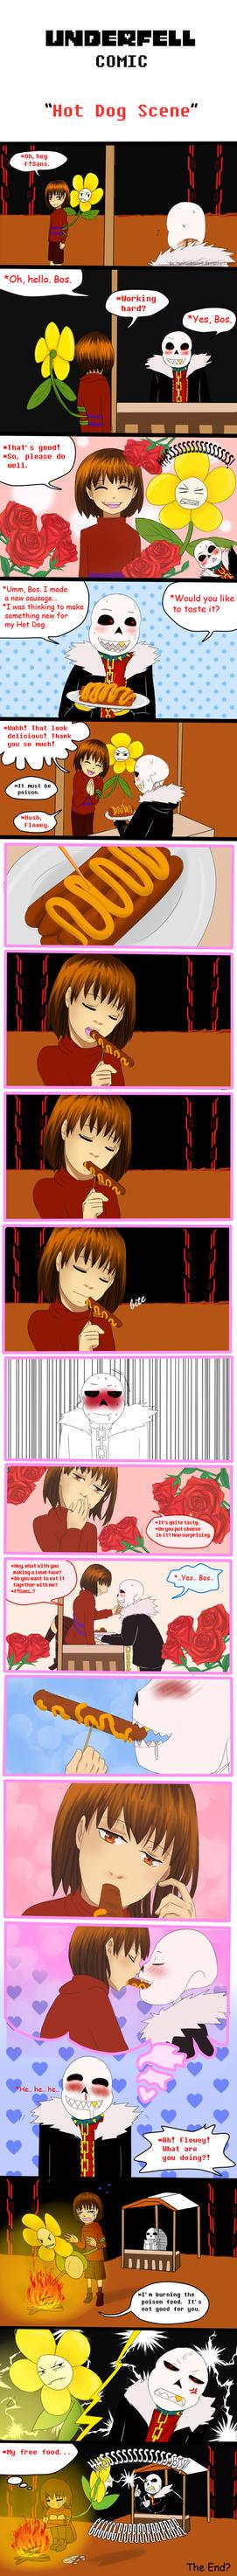 Underfell Comic: Hot Dog Scene by vanillaxbiscuit